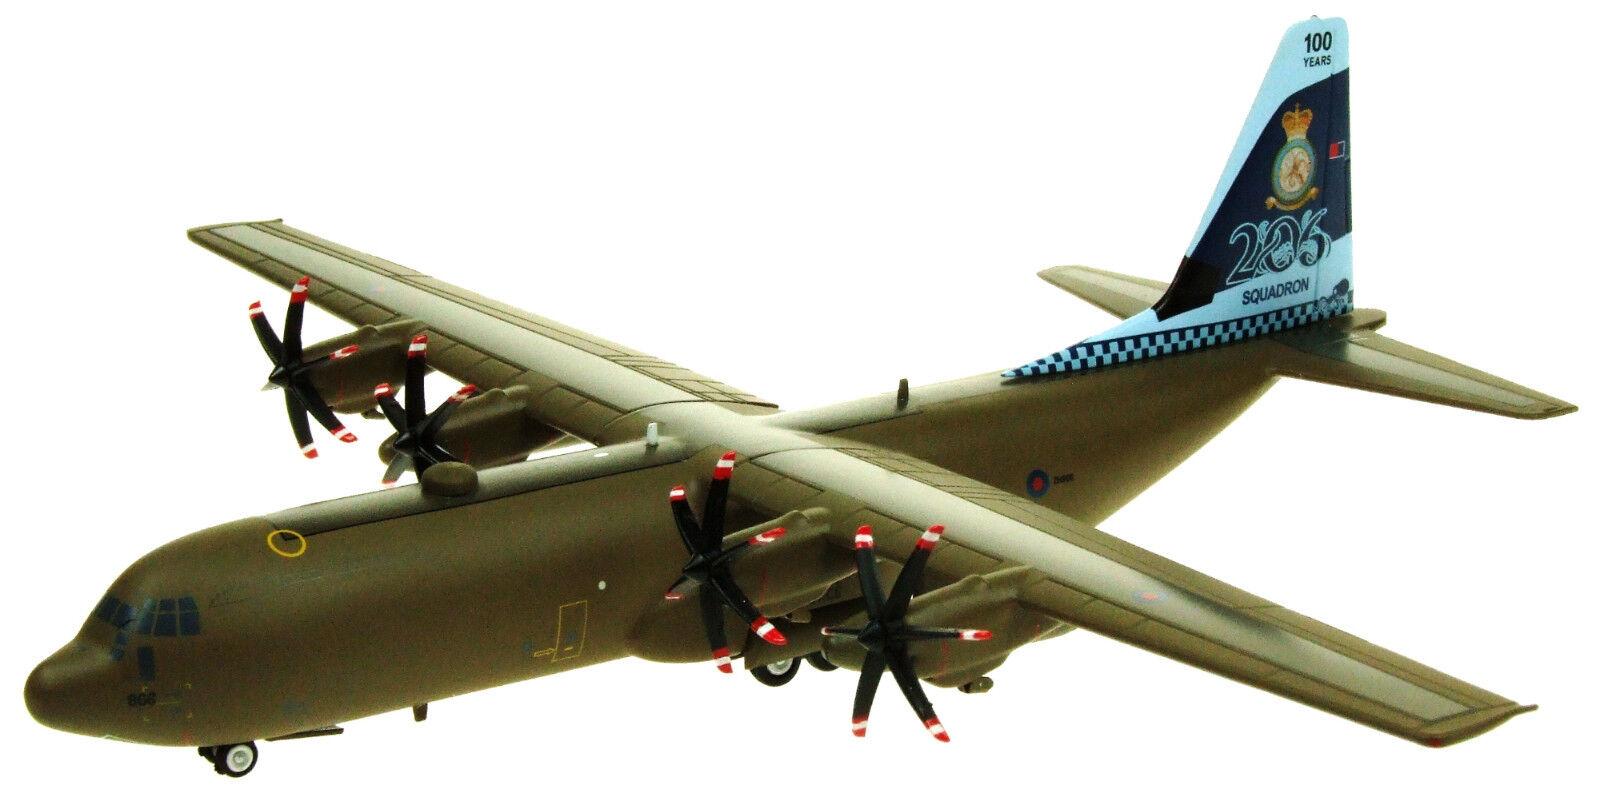 Ifclev 130866 1 200 C-130 Hercules RAF ZH866 Esron 206 100 ans Ltd Edn avec STD